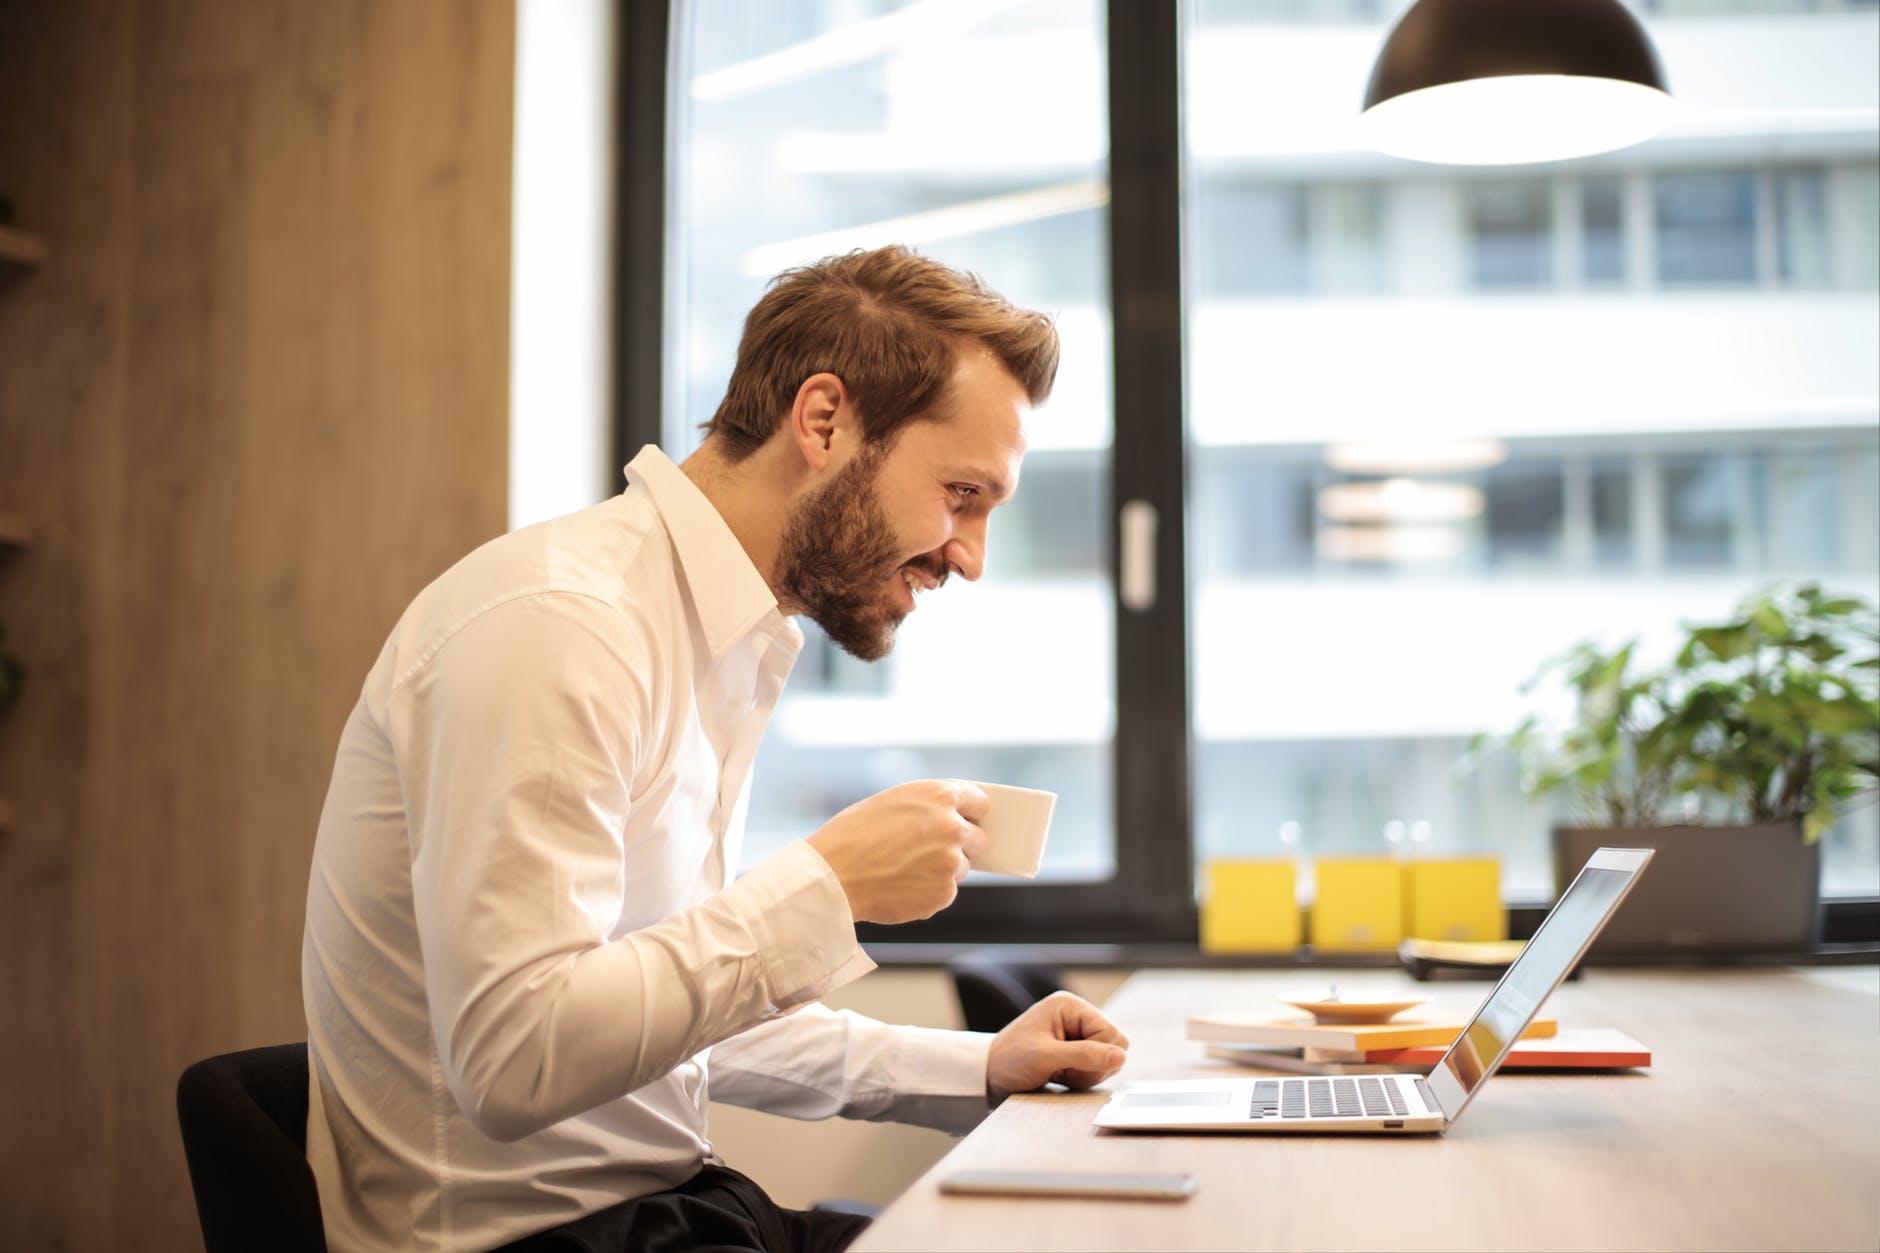 Pengertian Job Description yang Biasa Ditemui di Lowongan Kerja